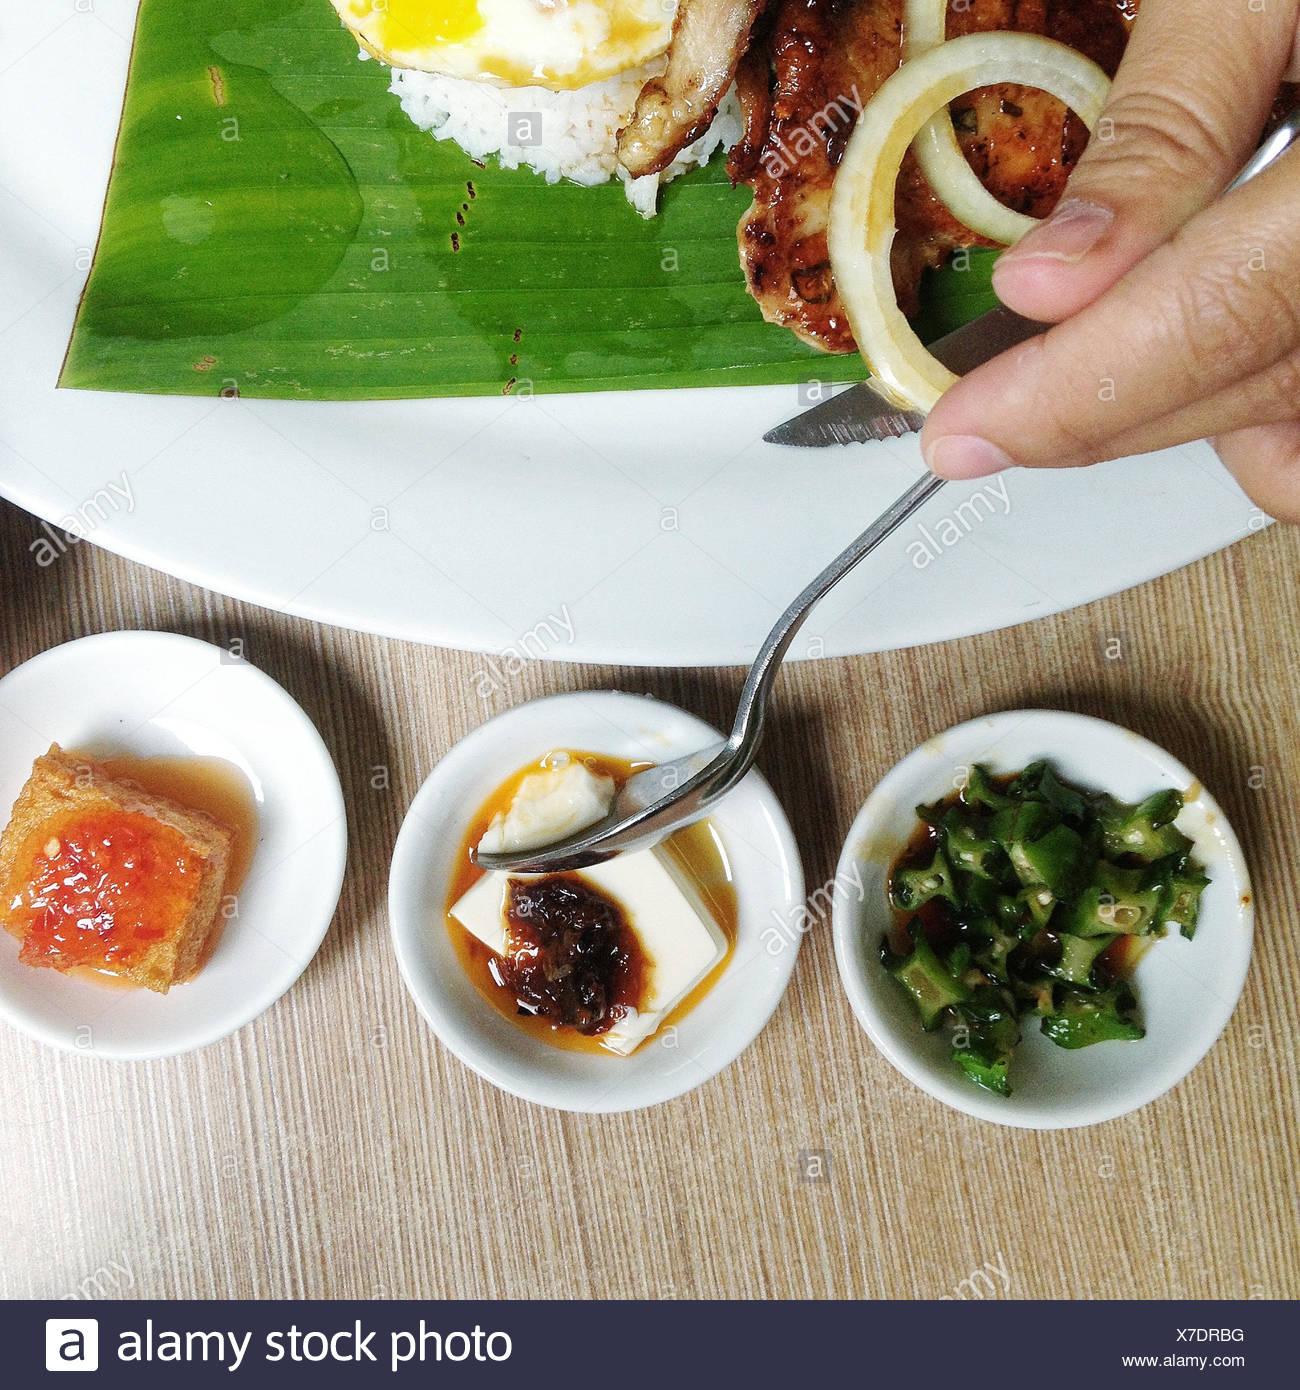 Malaysia, Kuala Lumpur, Traditional asian food - Stock Image